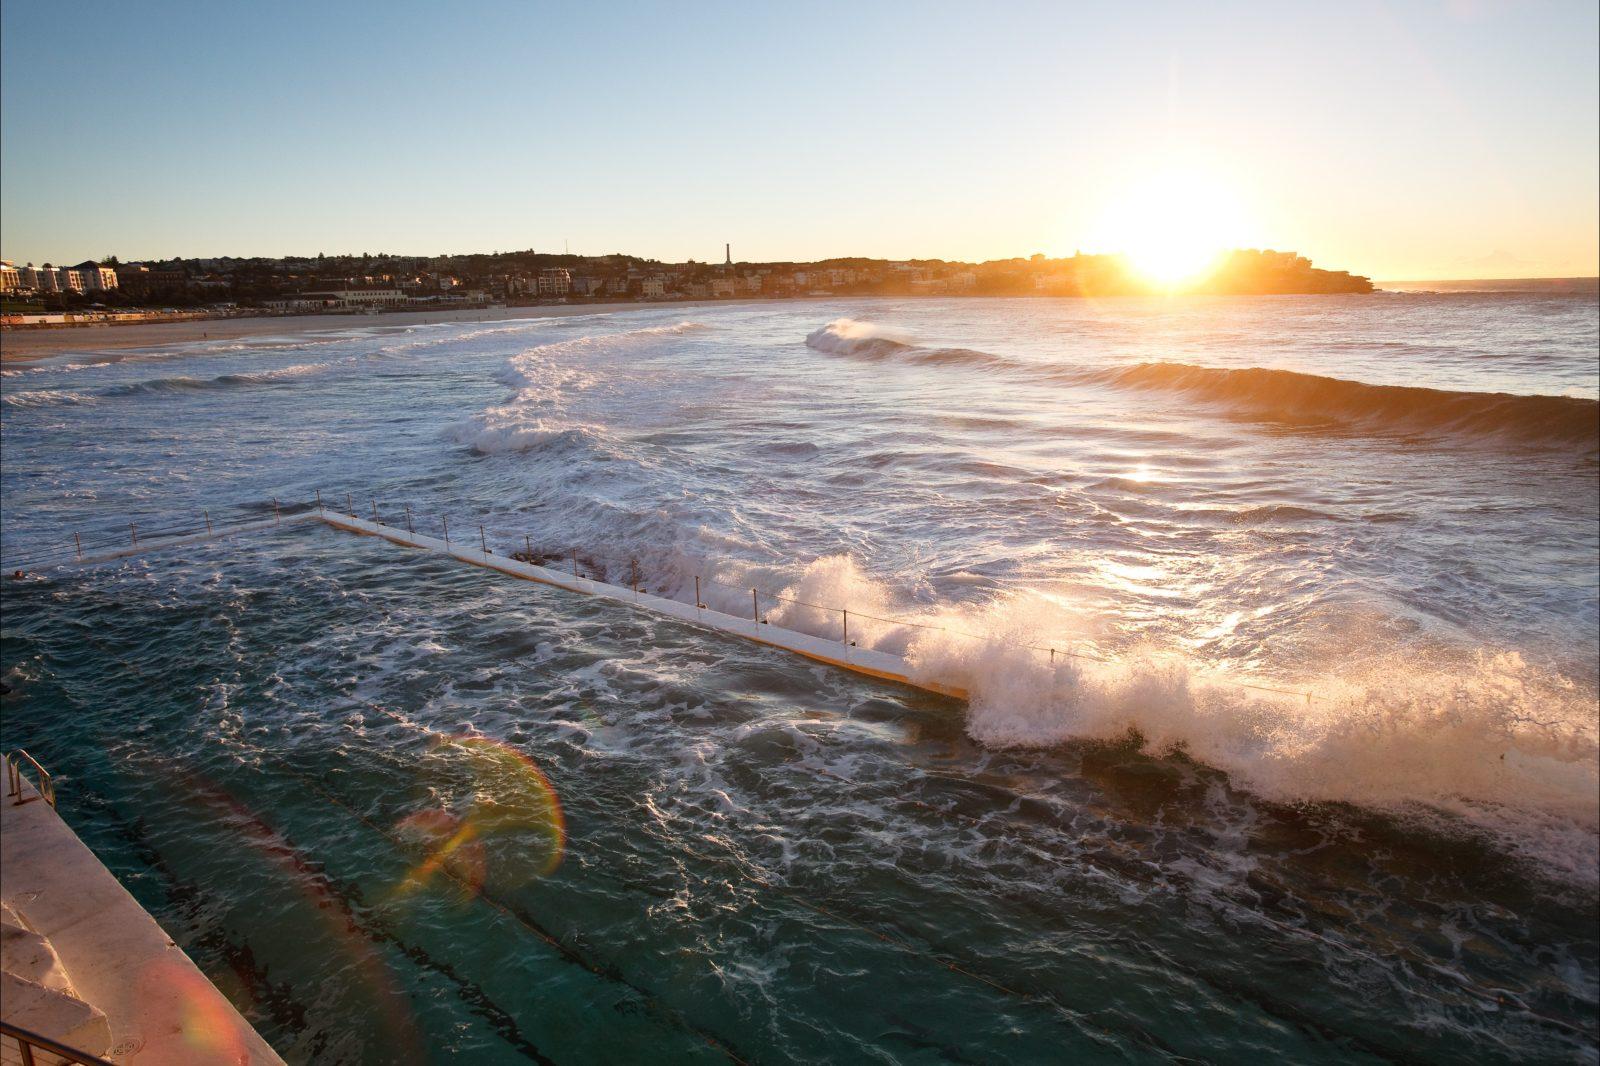 Sunrise at Bondi Beach with Bondi ocean pool in foreground. View from Bondi Icebergs Club